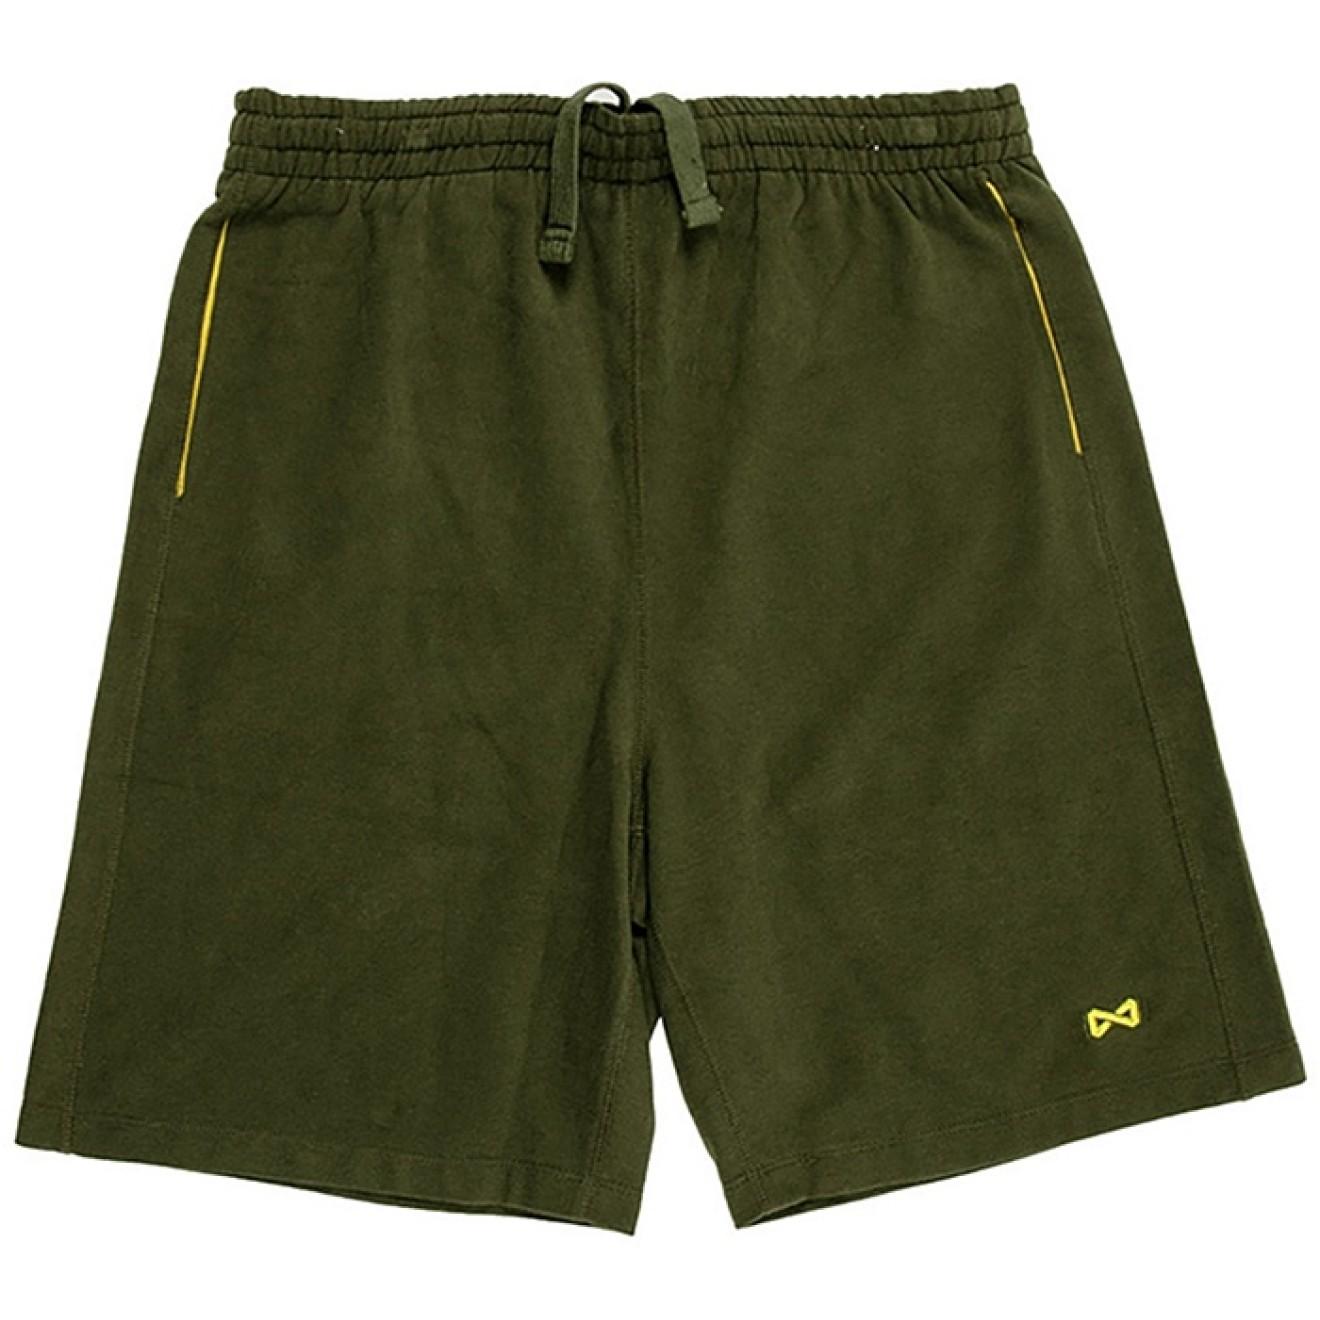 Green Navitas Navitas Jogga Shorts Lite PvmnyN0wO8